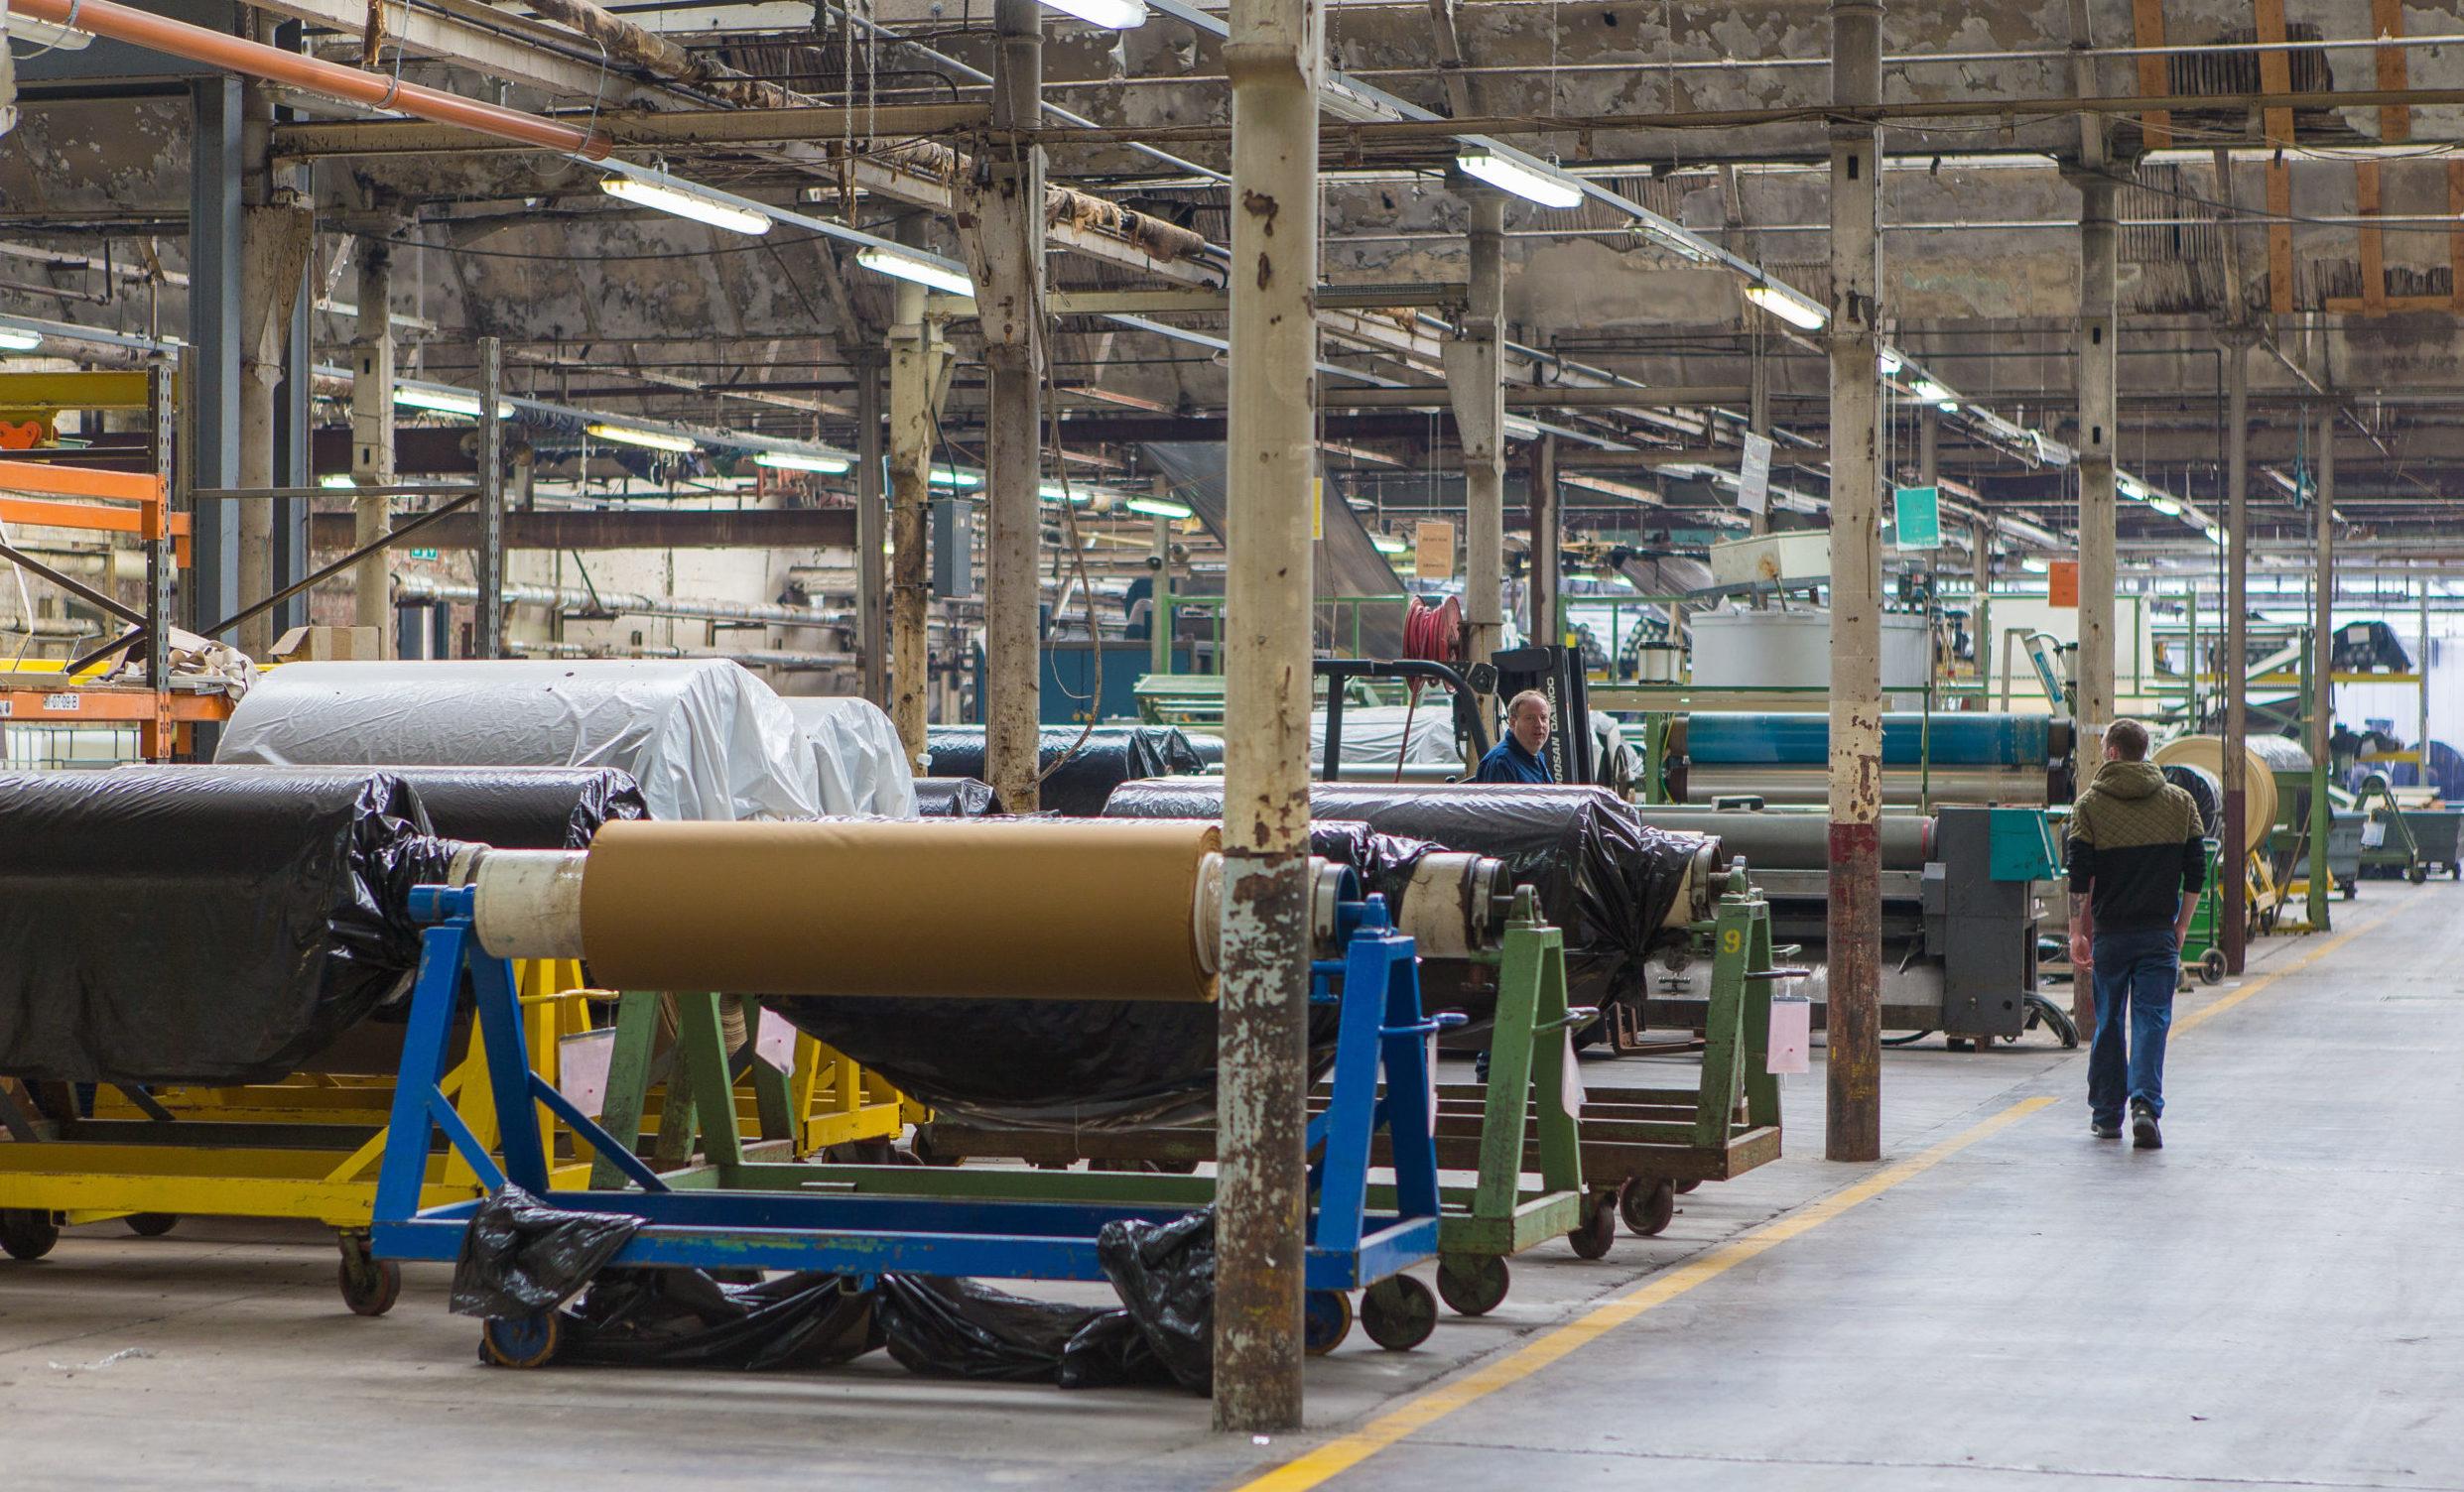 The Halley Stevenson factory